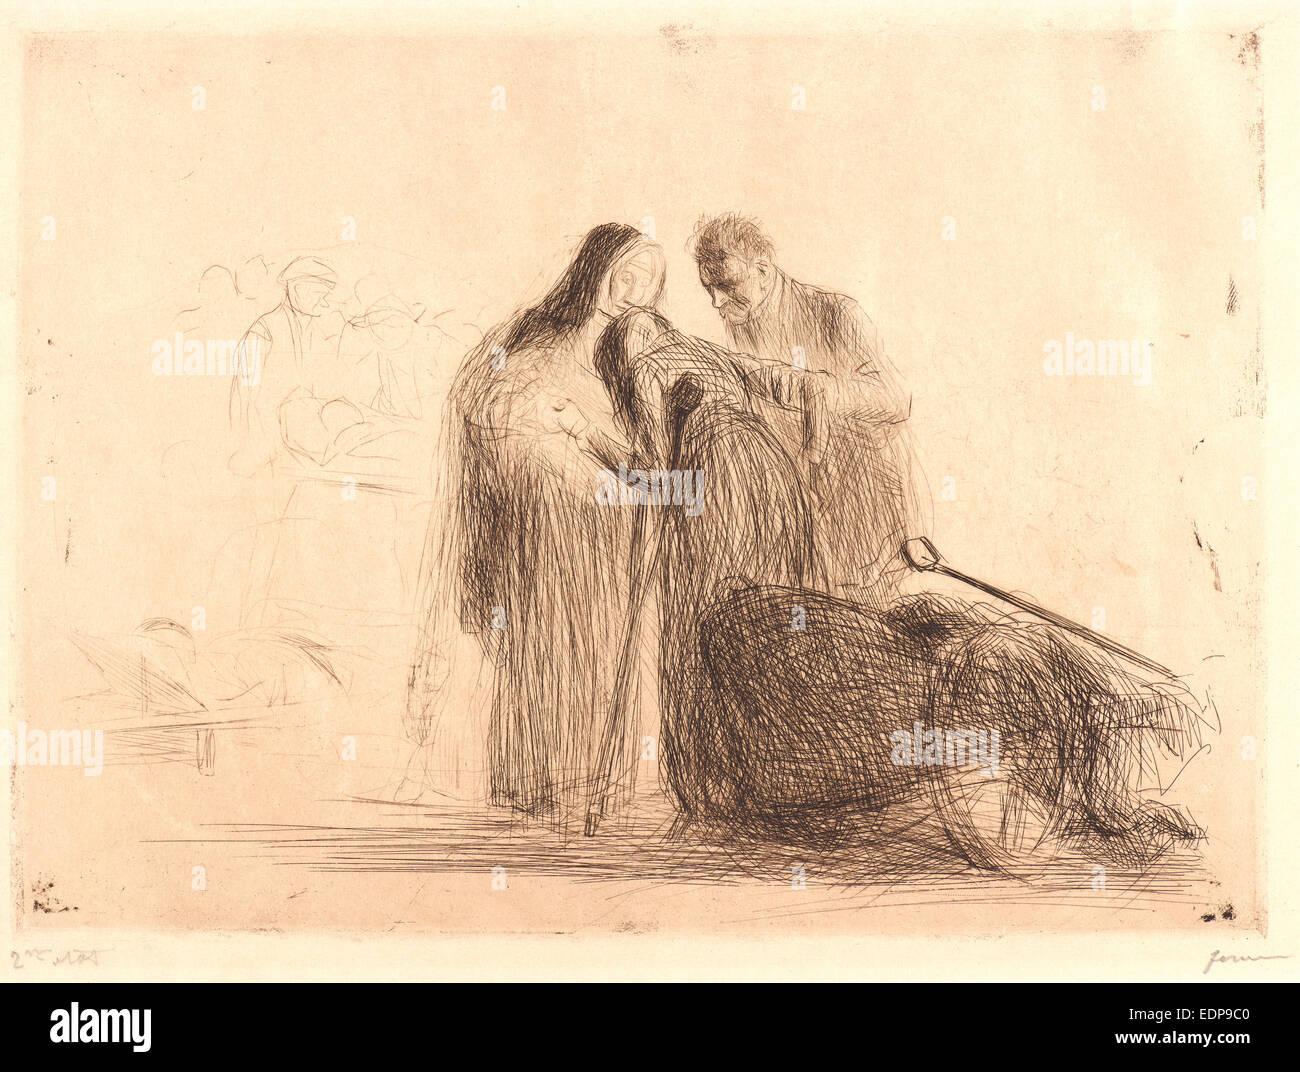 Jean Louis Forain (French, 1852 - 1931). Lourdes: La Paralytique. Etching on wove paper - Stock Image